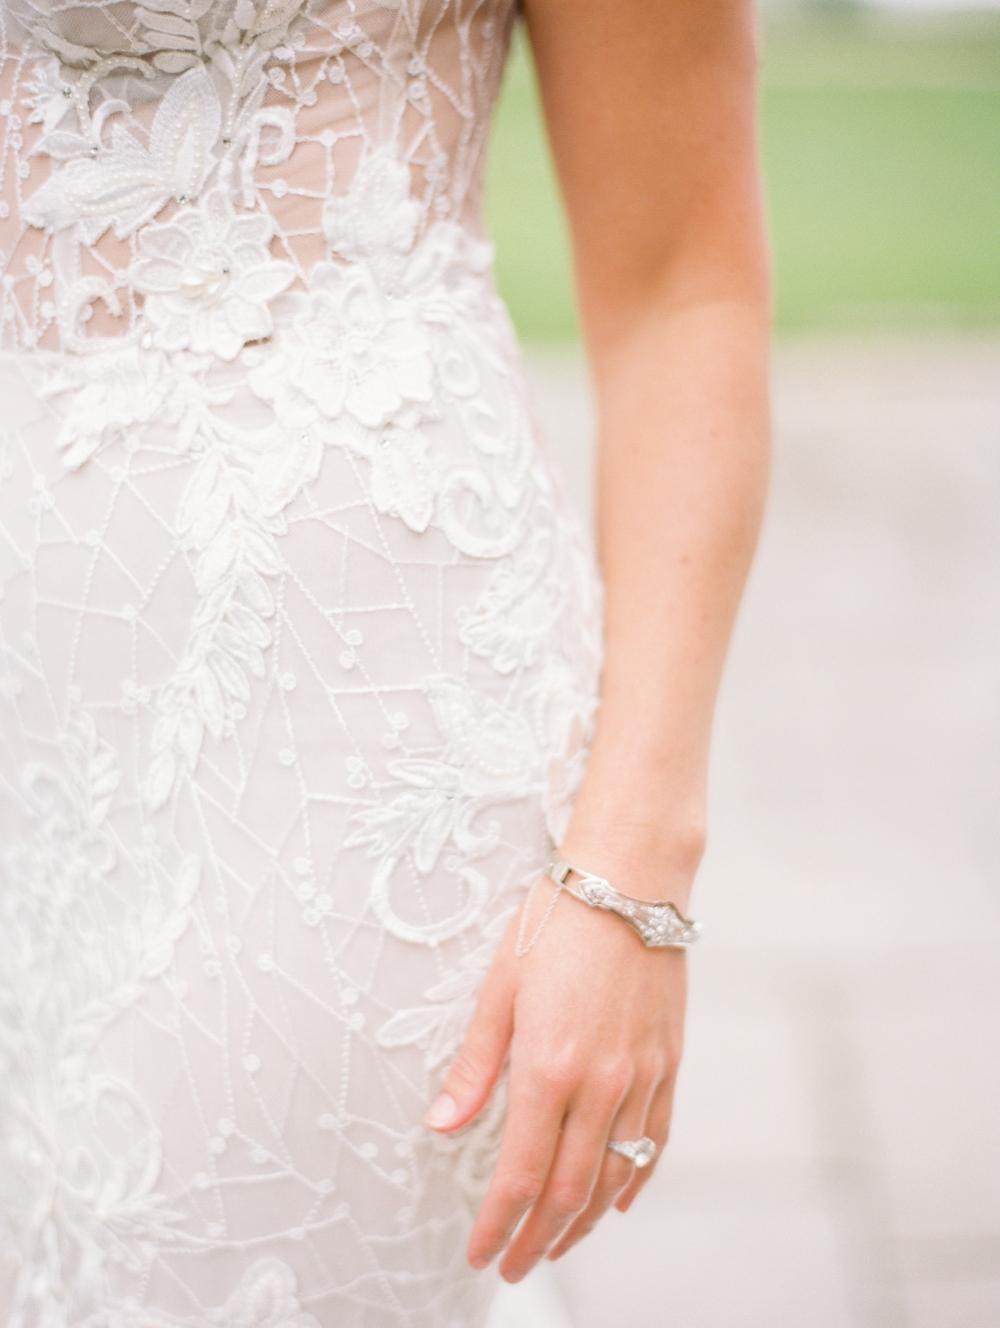 Kristin-La-Voie-Photography-CHICAGO-WEDDING-PHOTOGRAPHER-KOHLER-WHISTLING-STRAITS-128